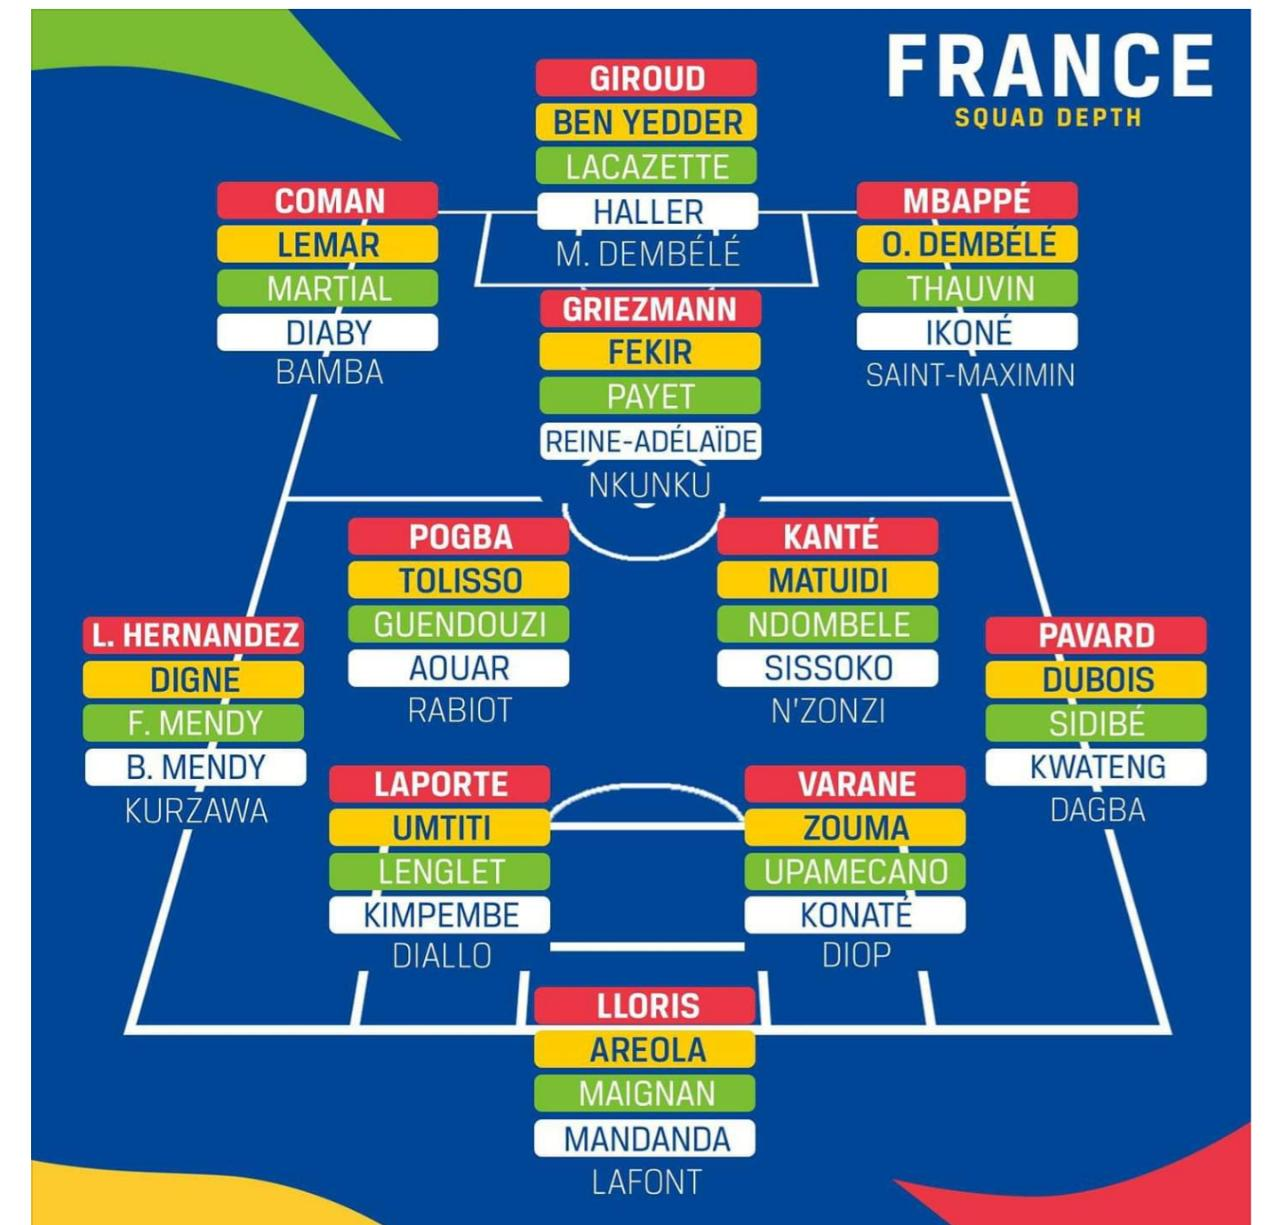 Medál biztonsági mentés ujj france national team roster. France S National Team Depth Will Blow Your Mind